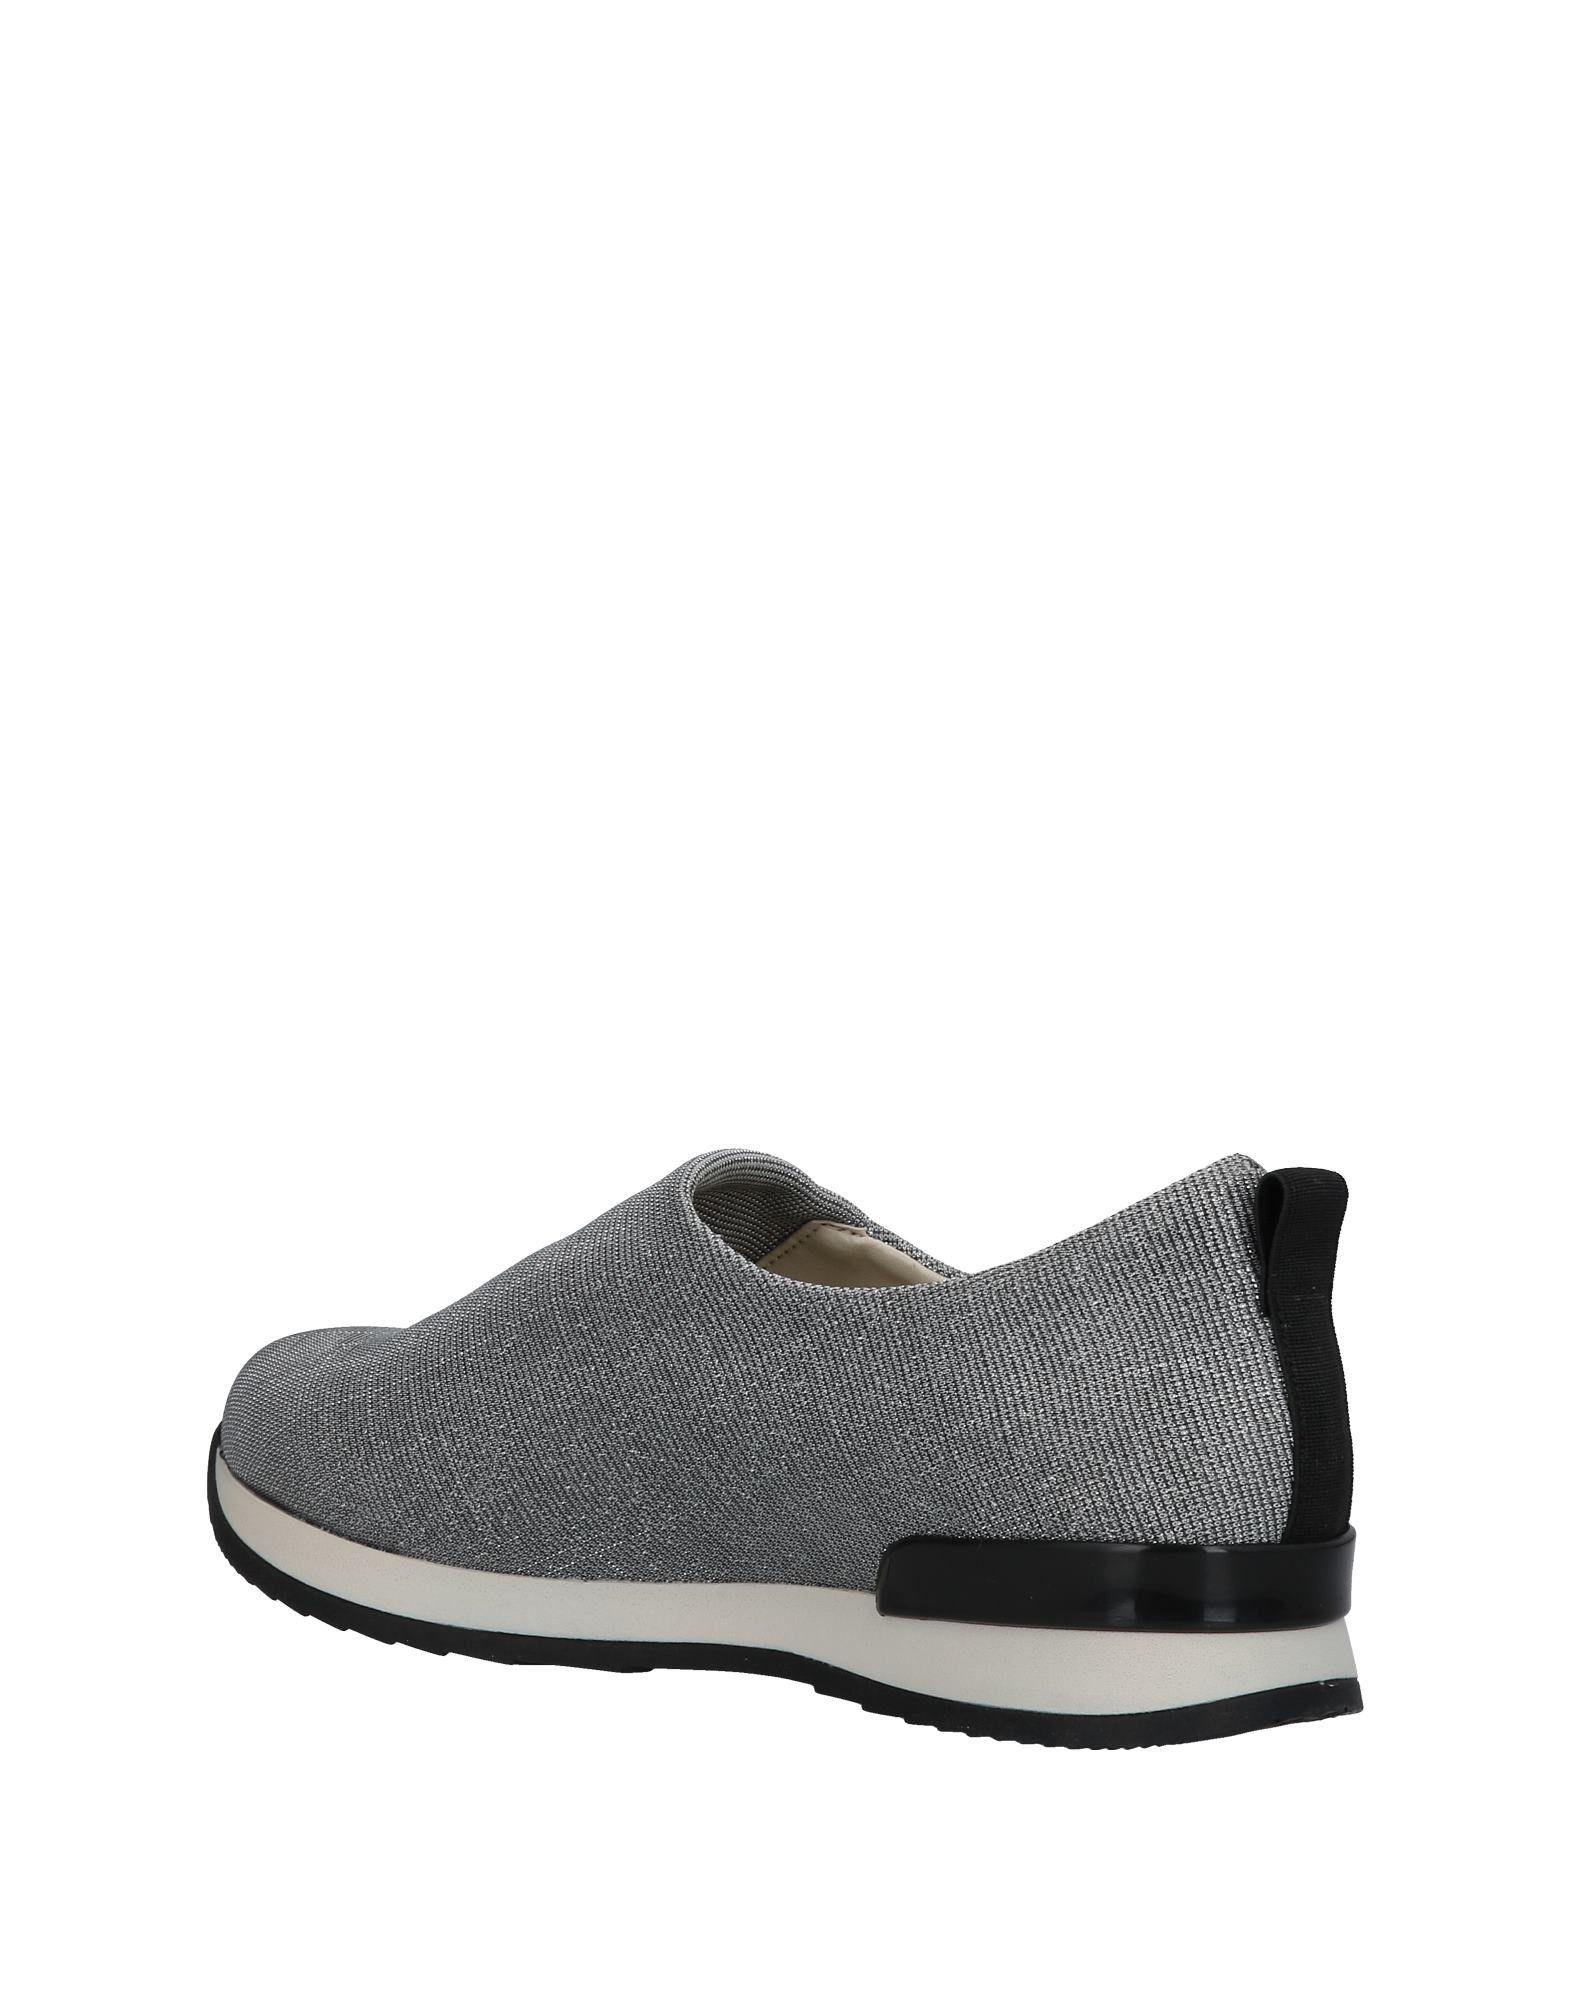 Nr Rapisardi Sneakers Damen Schuhe  11419290AB Neue Schuhe Damen ca224c